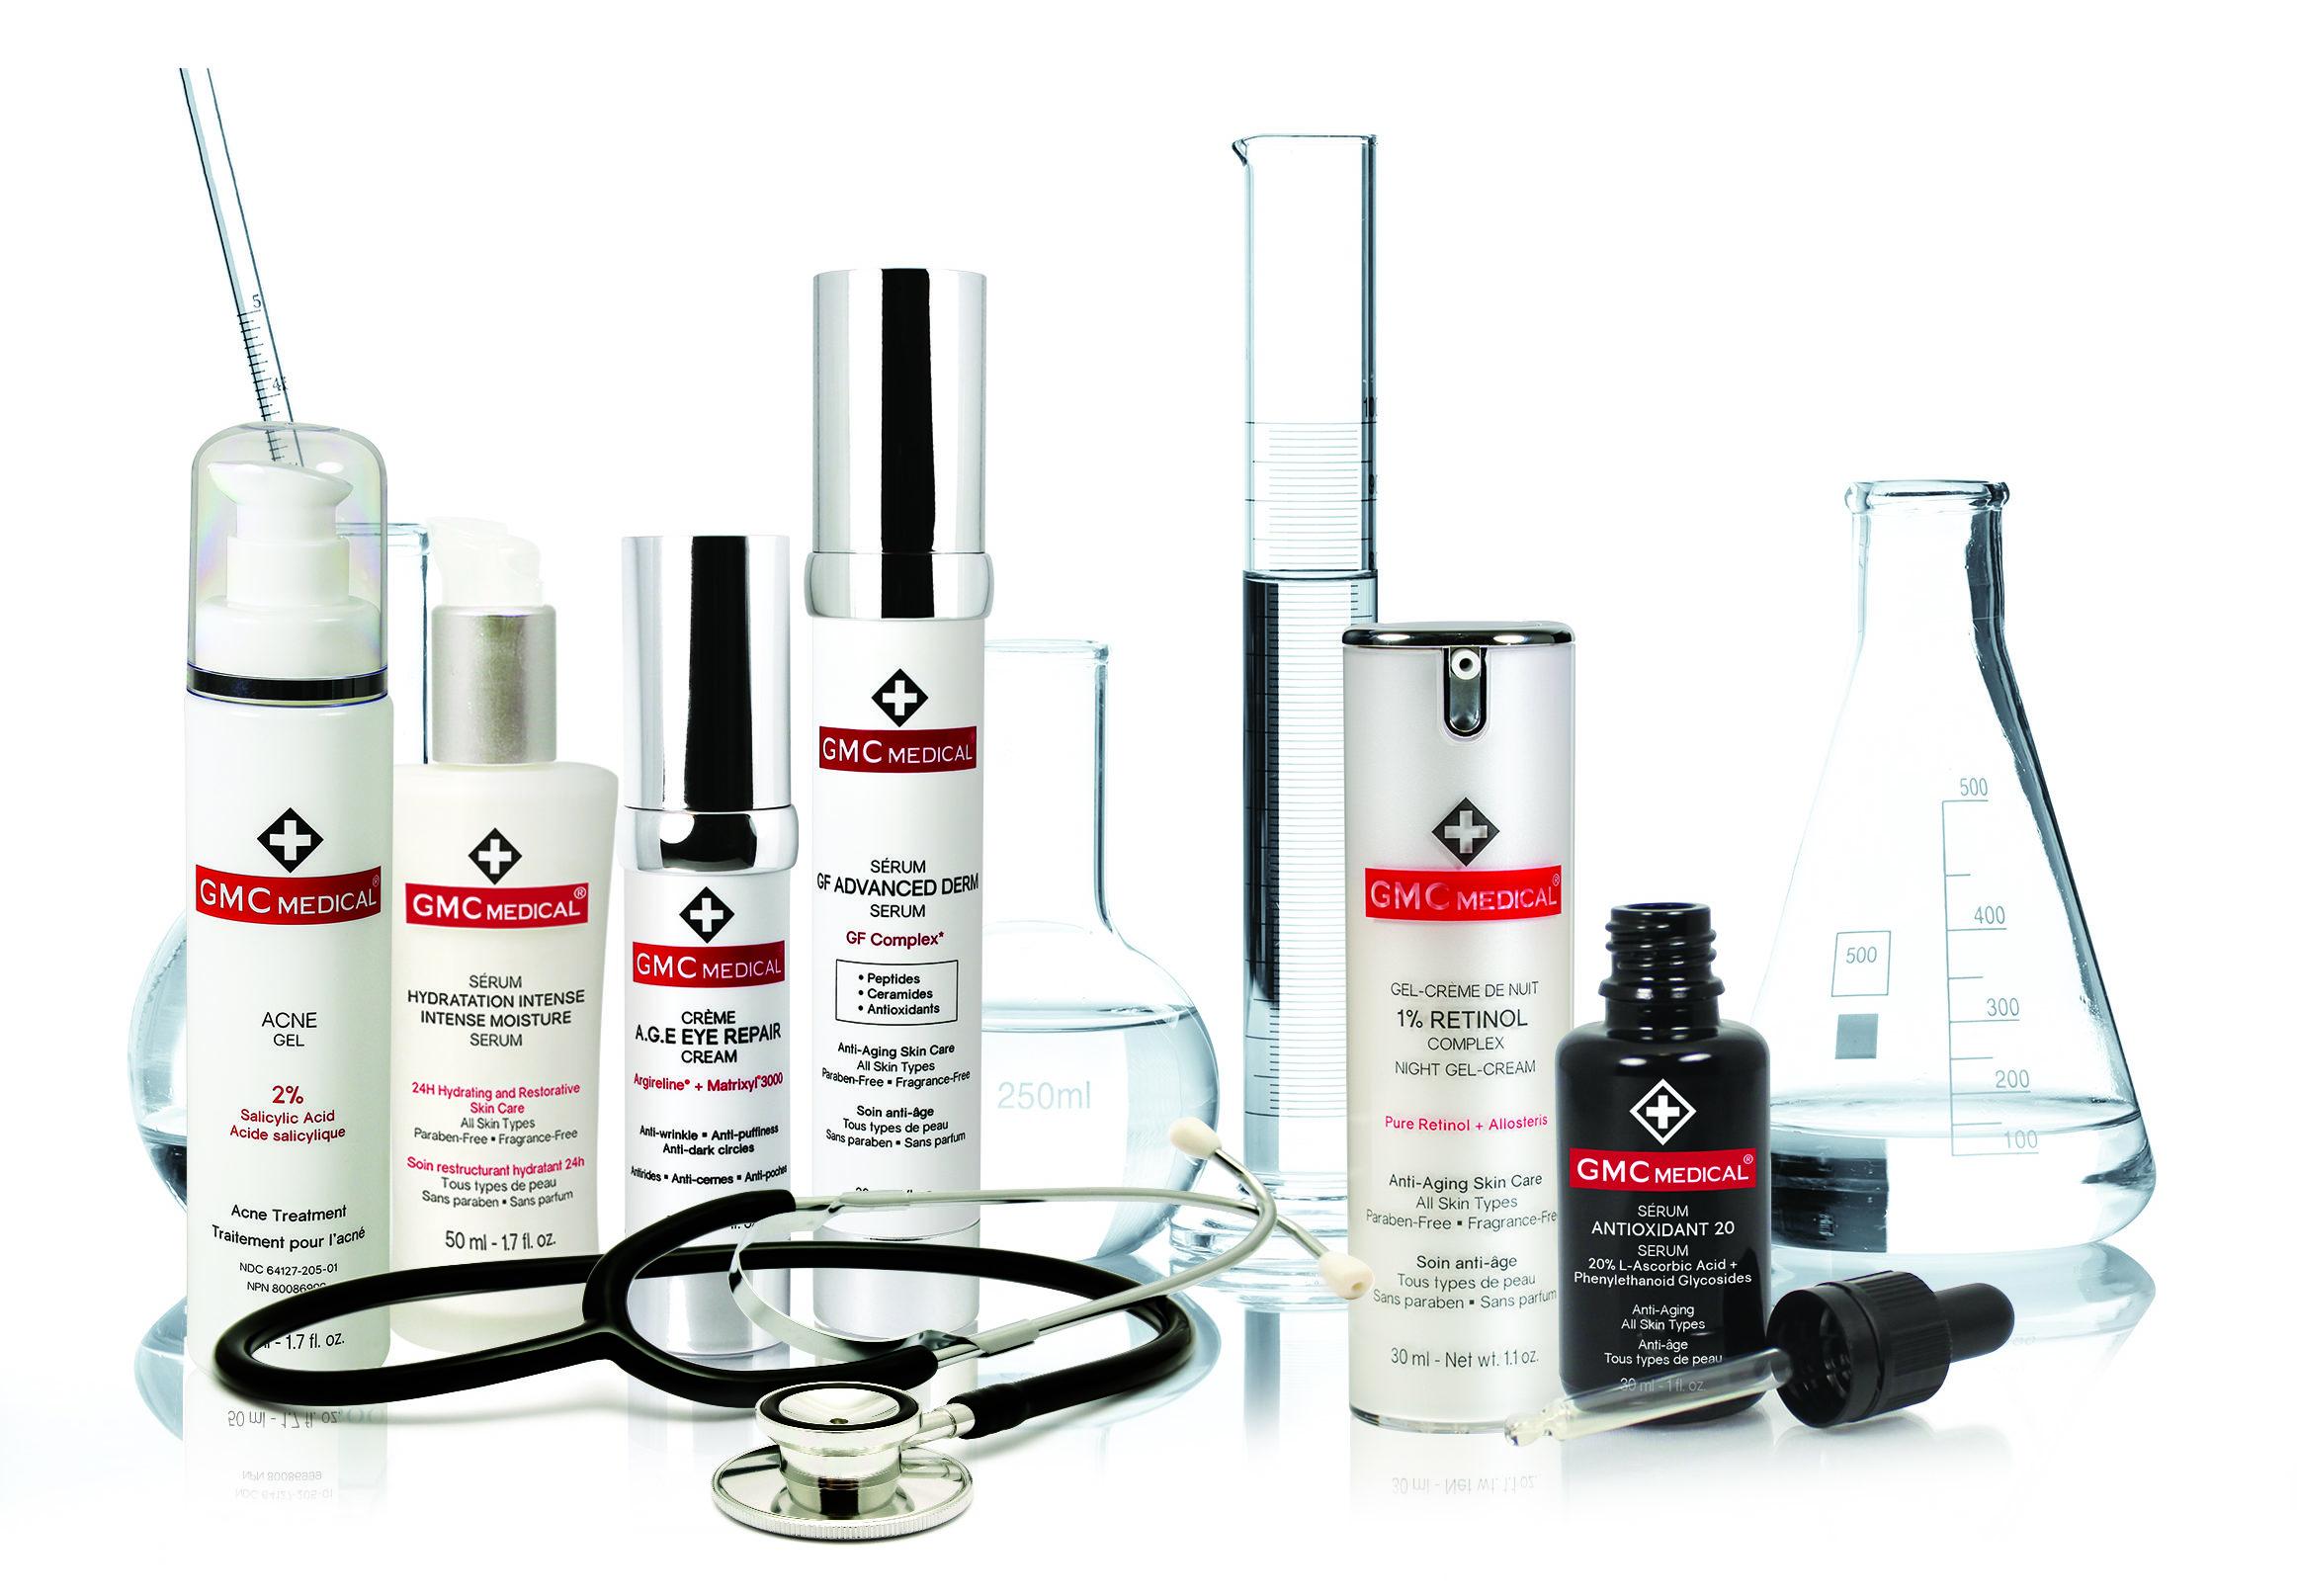 GMC Medical